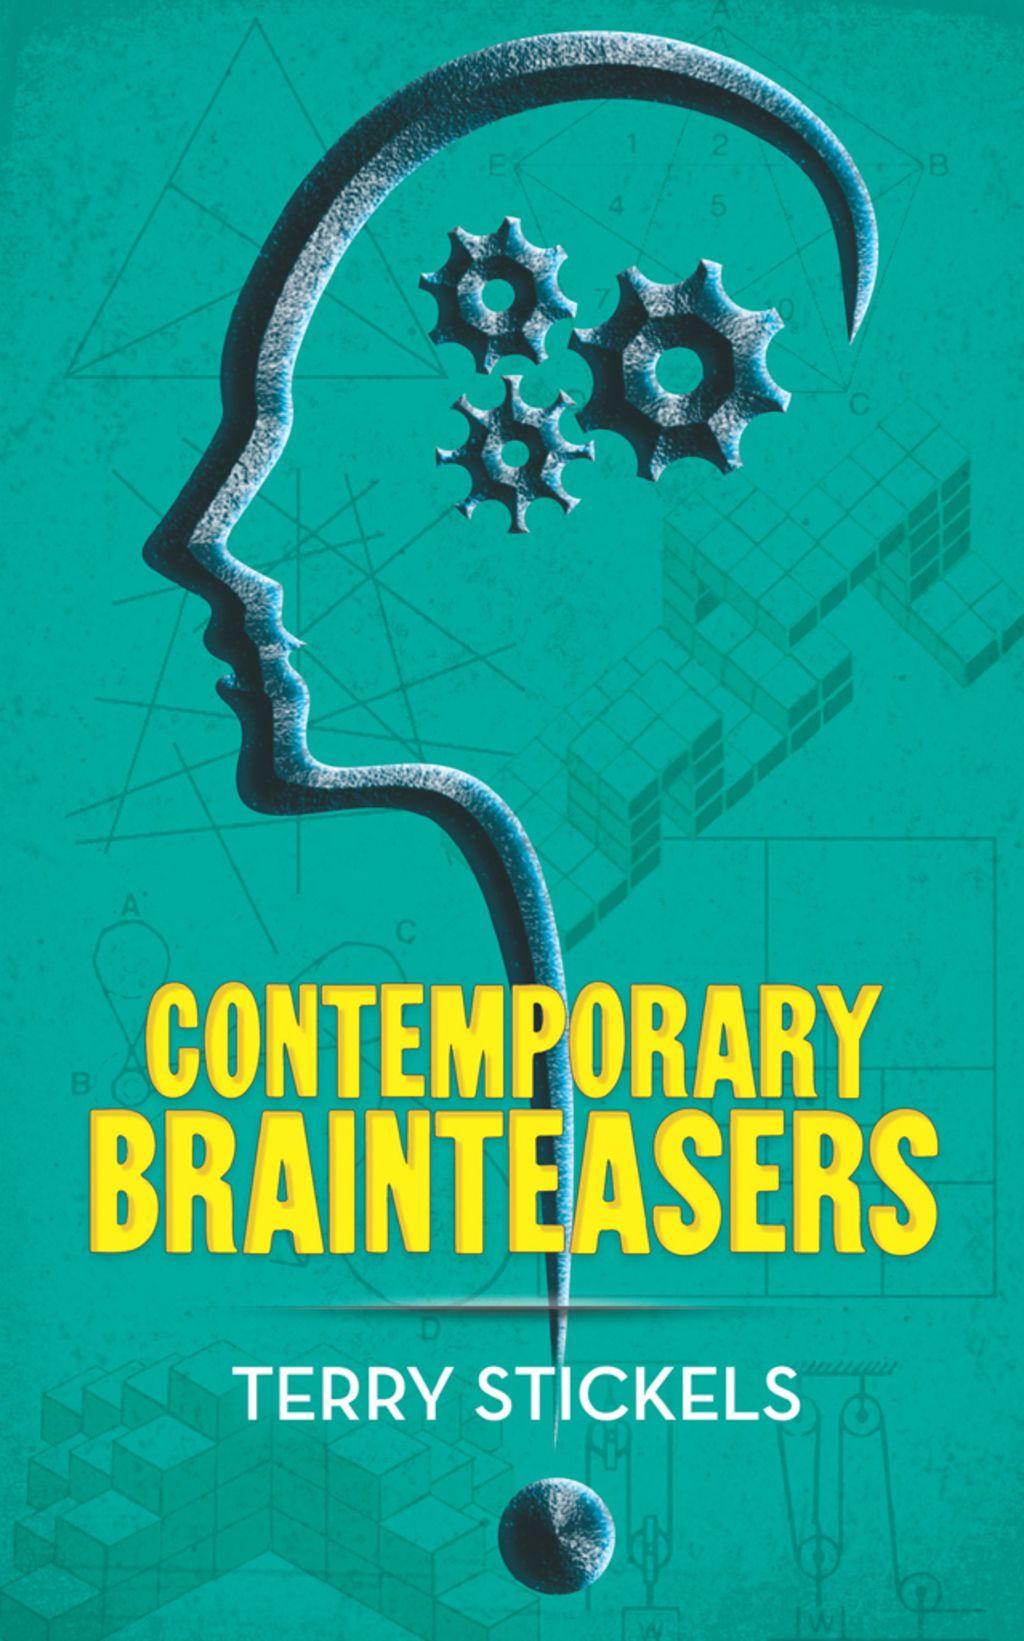 Contemporary Brainteasers Ebook